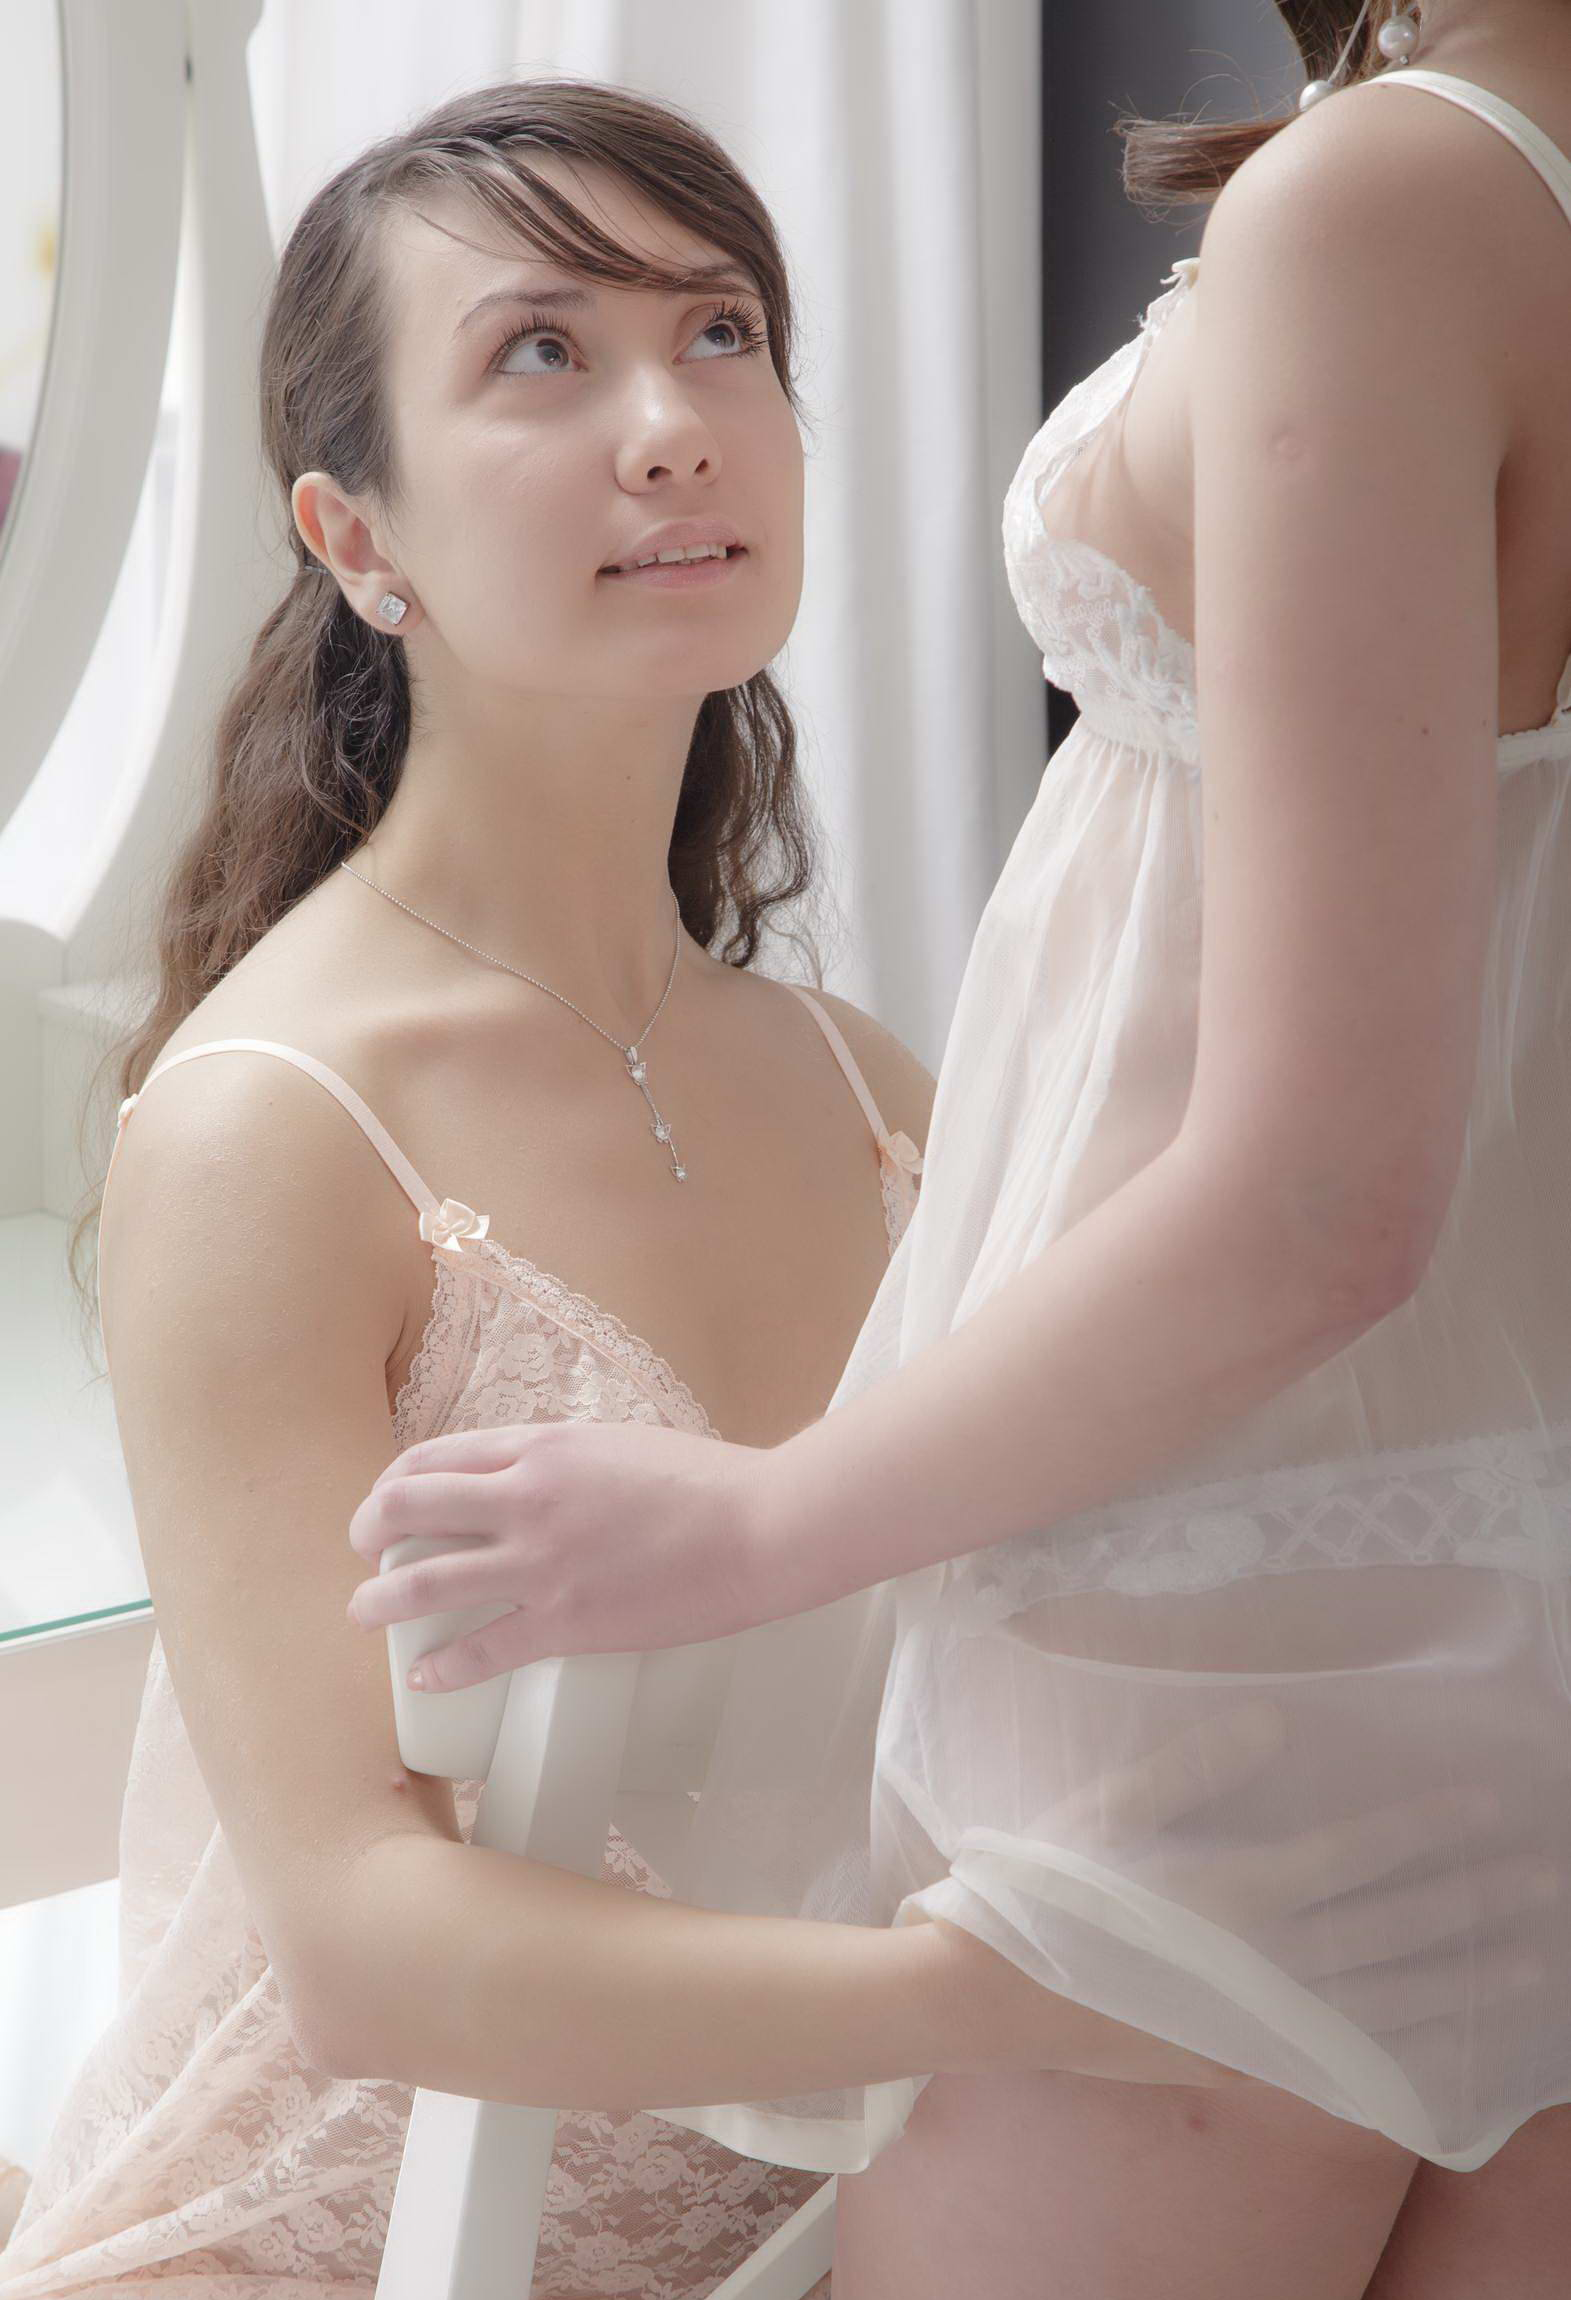 Красивые трах брюнеток, трахает жену